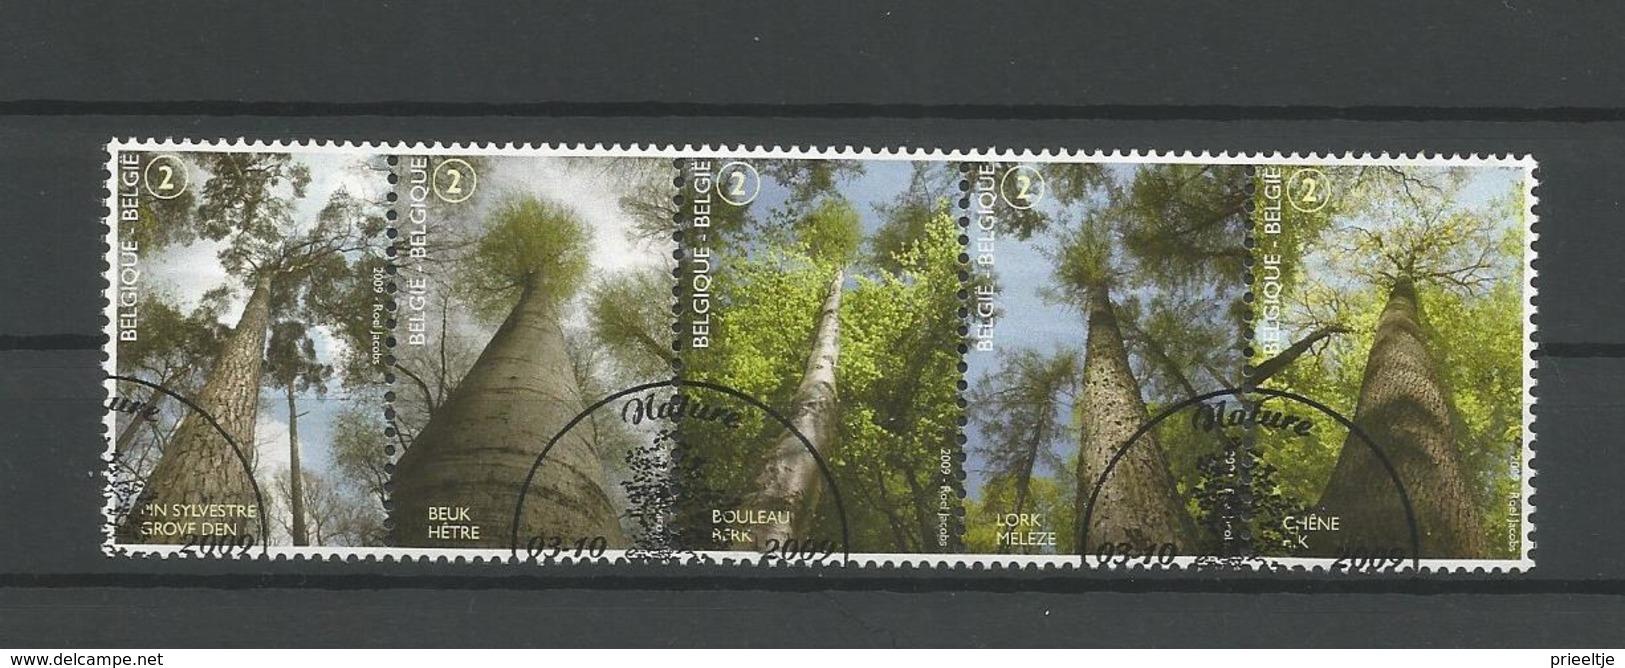 Belgium 2009 Forest Strip OCB 3951/3955 (0) - Belgien